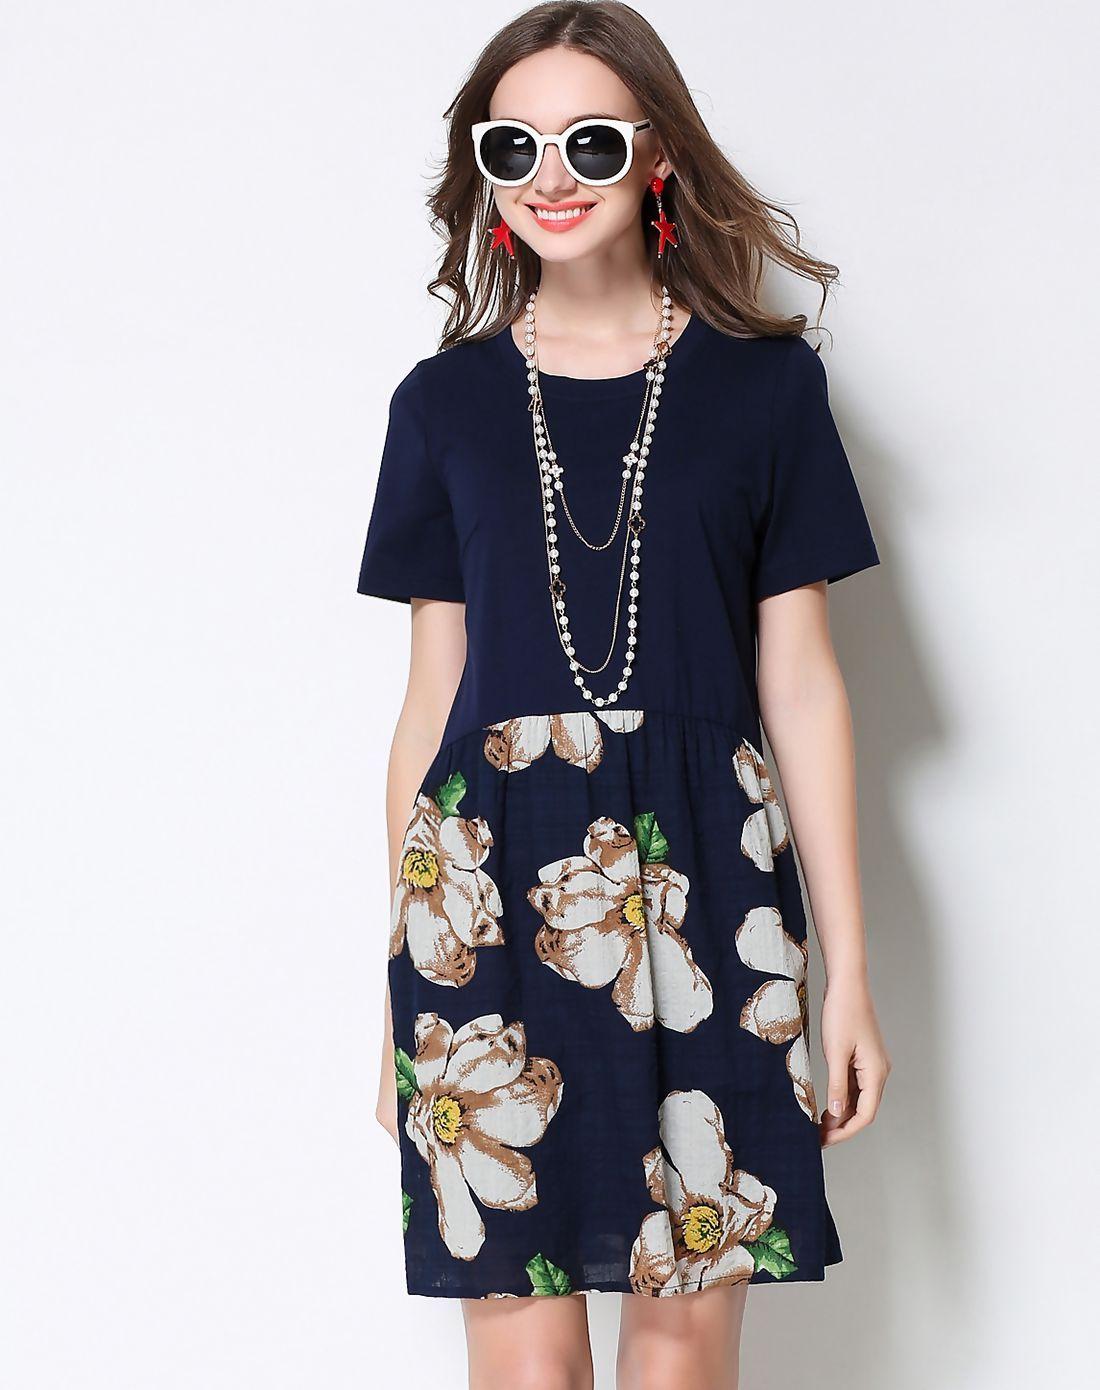 Adorewe vipme aline dressesdesigner meidongtai black plus size